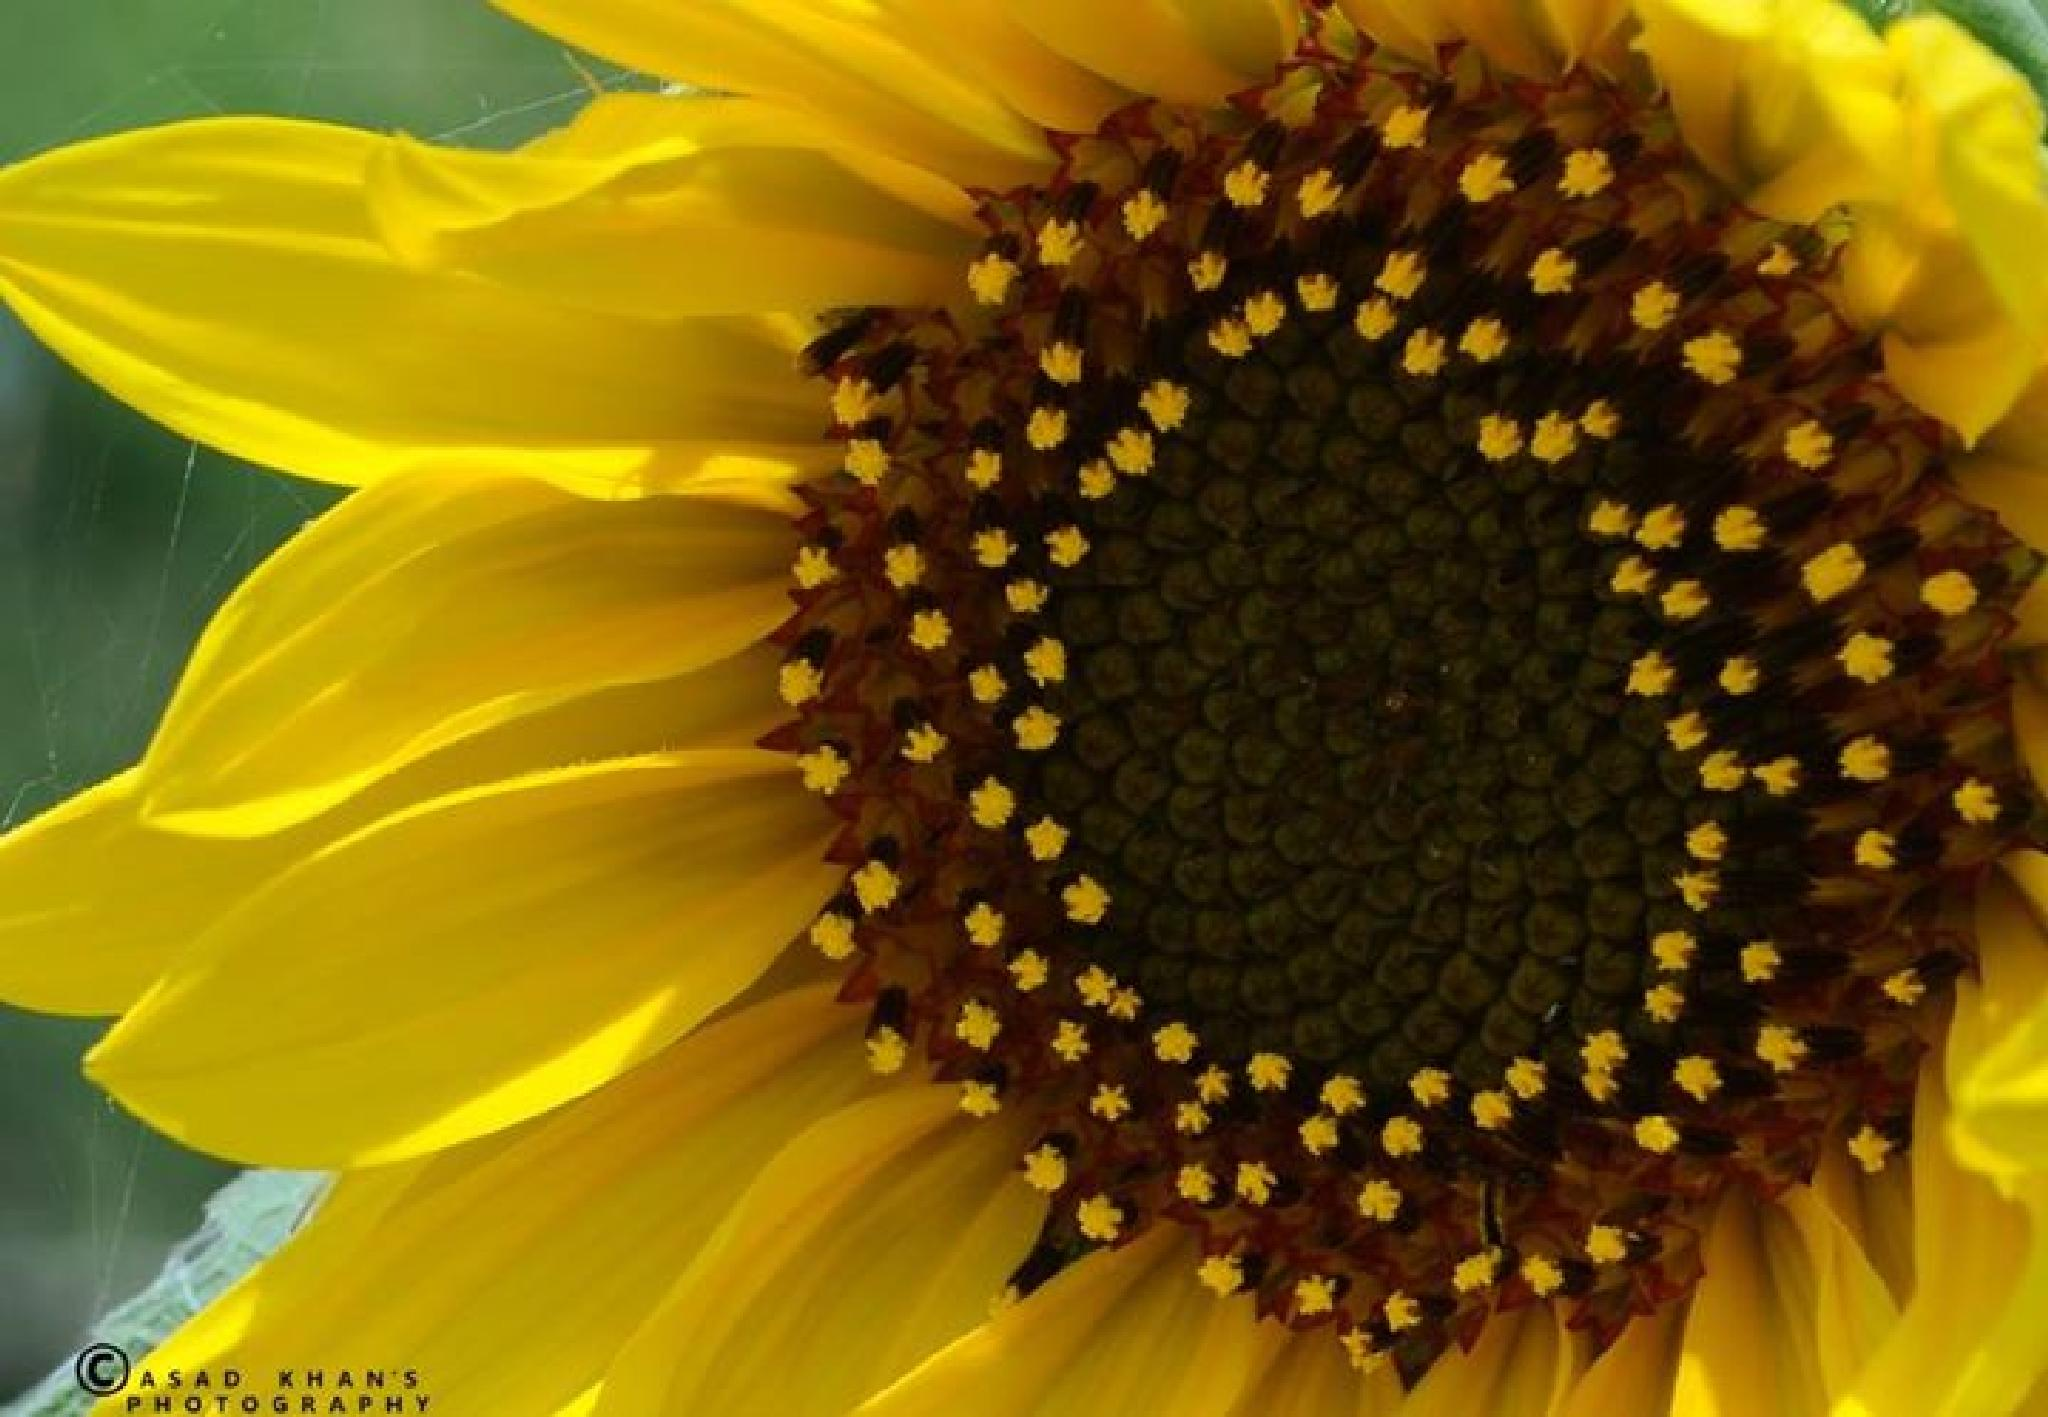 Sun Flower by Muhammad Asad Khan